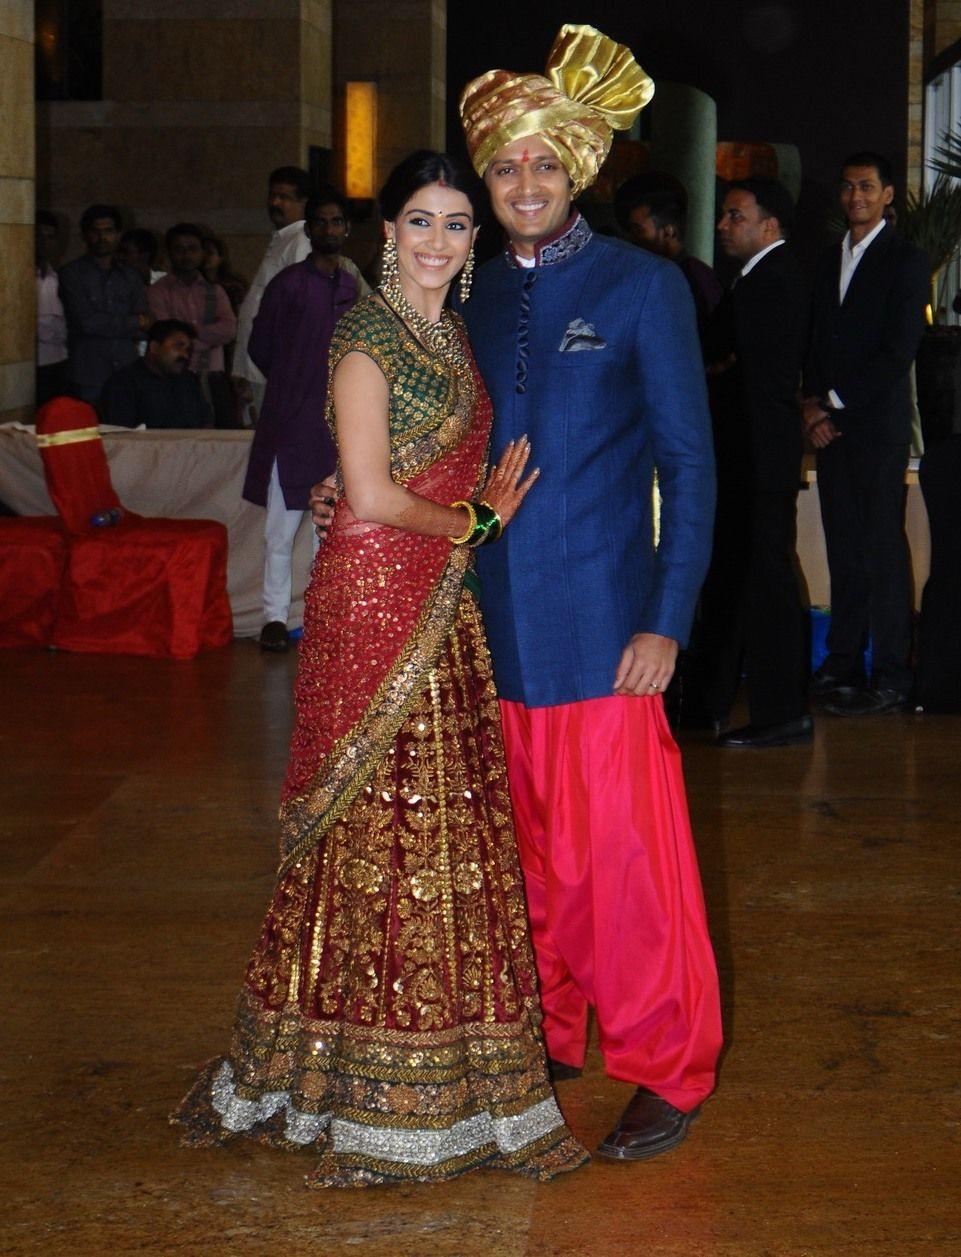 Happy 2nd Wedding Anniversary to Genelia and Riteish ...